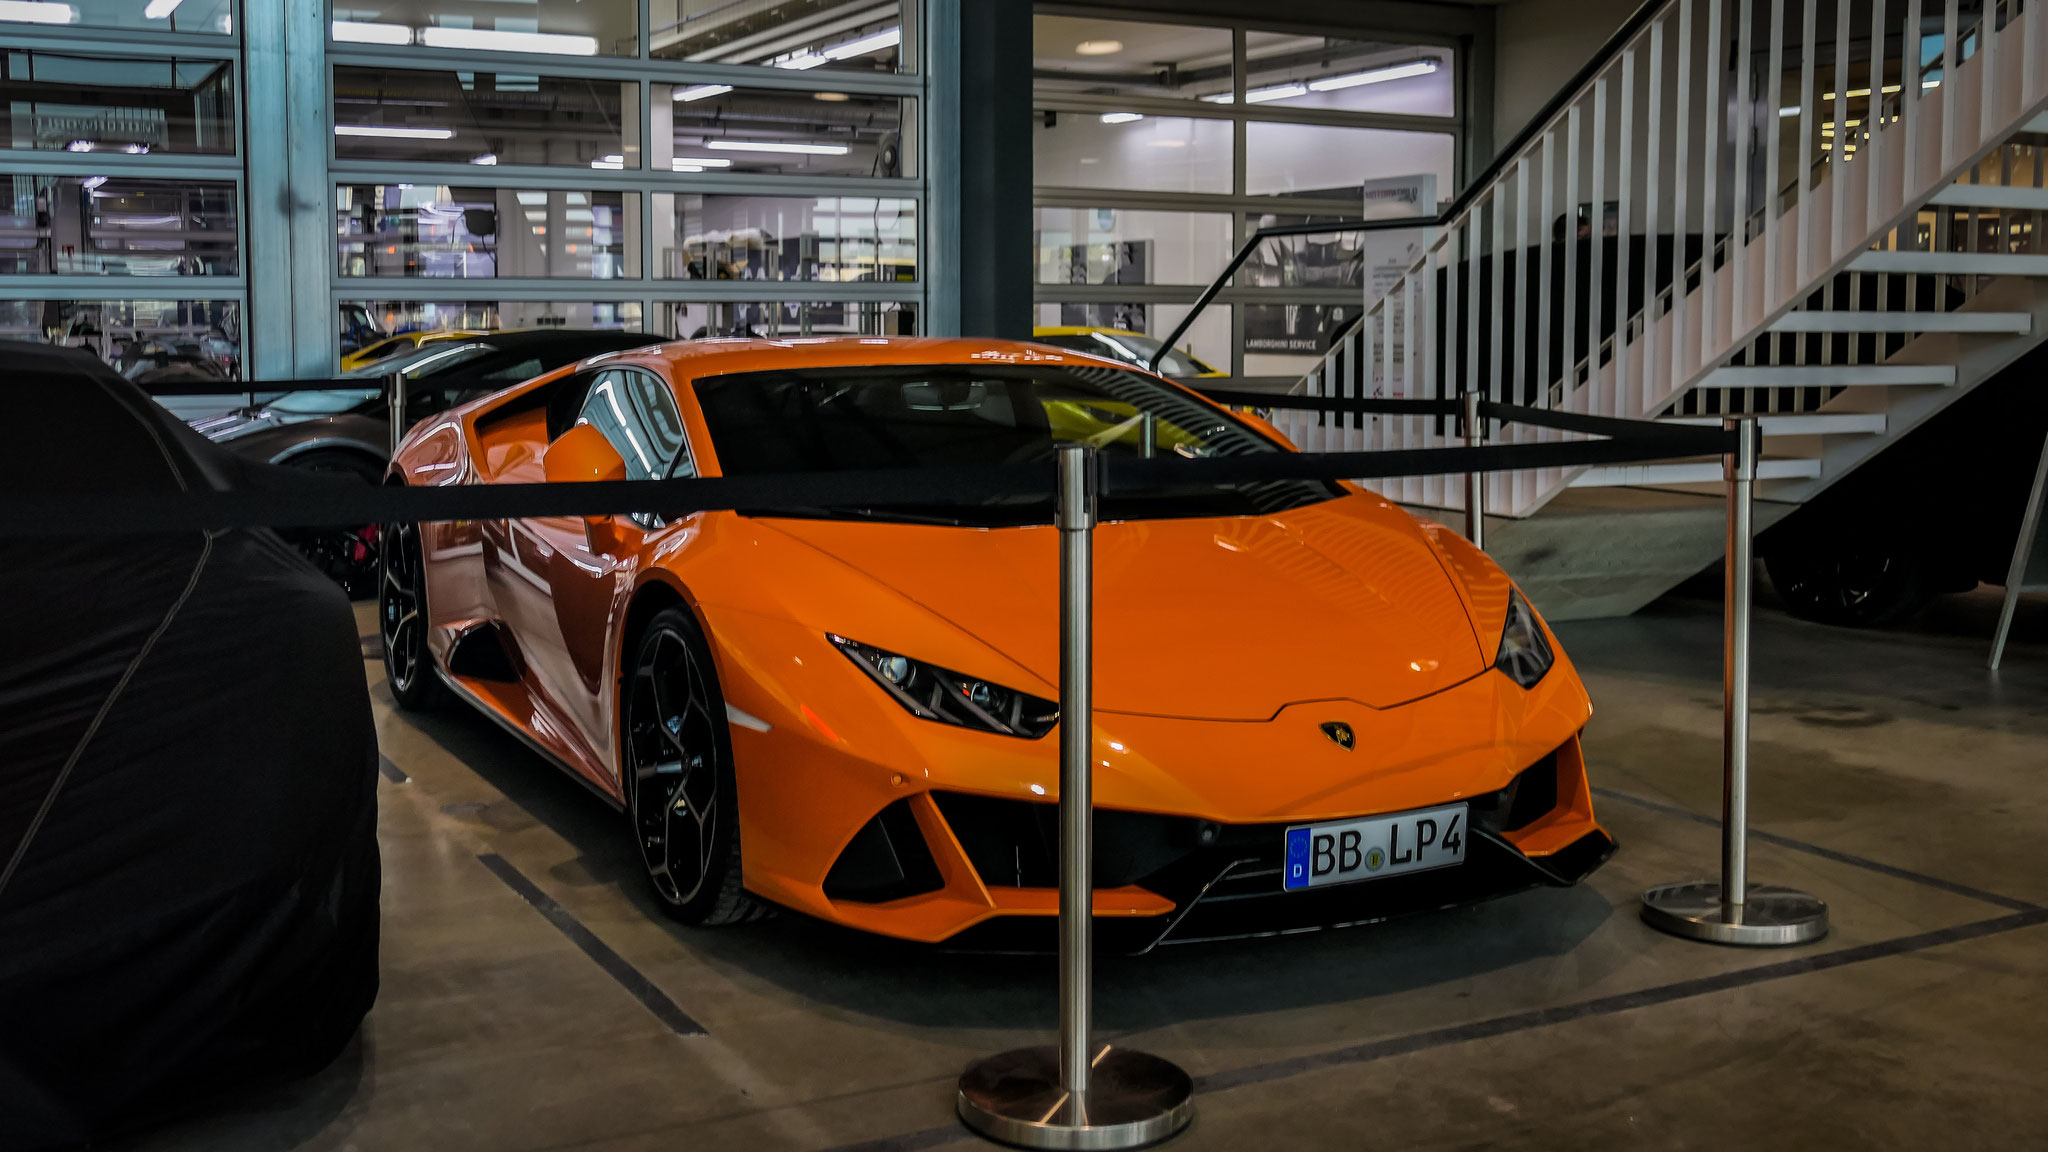 Lamborghini Huracan Evo - BB-LP-4